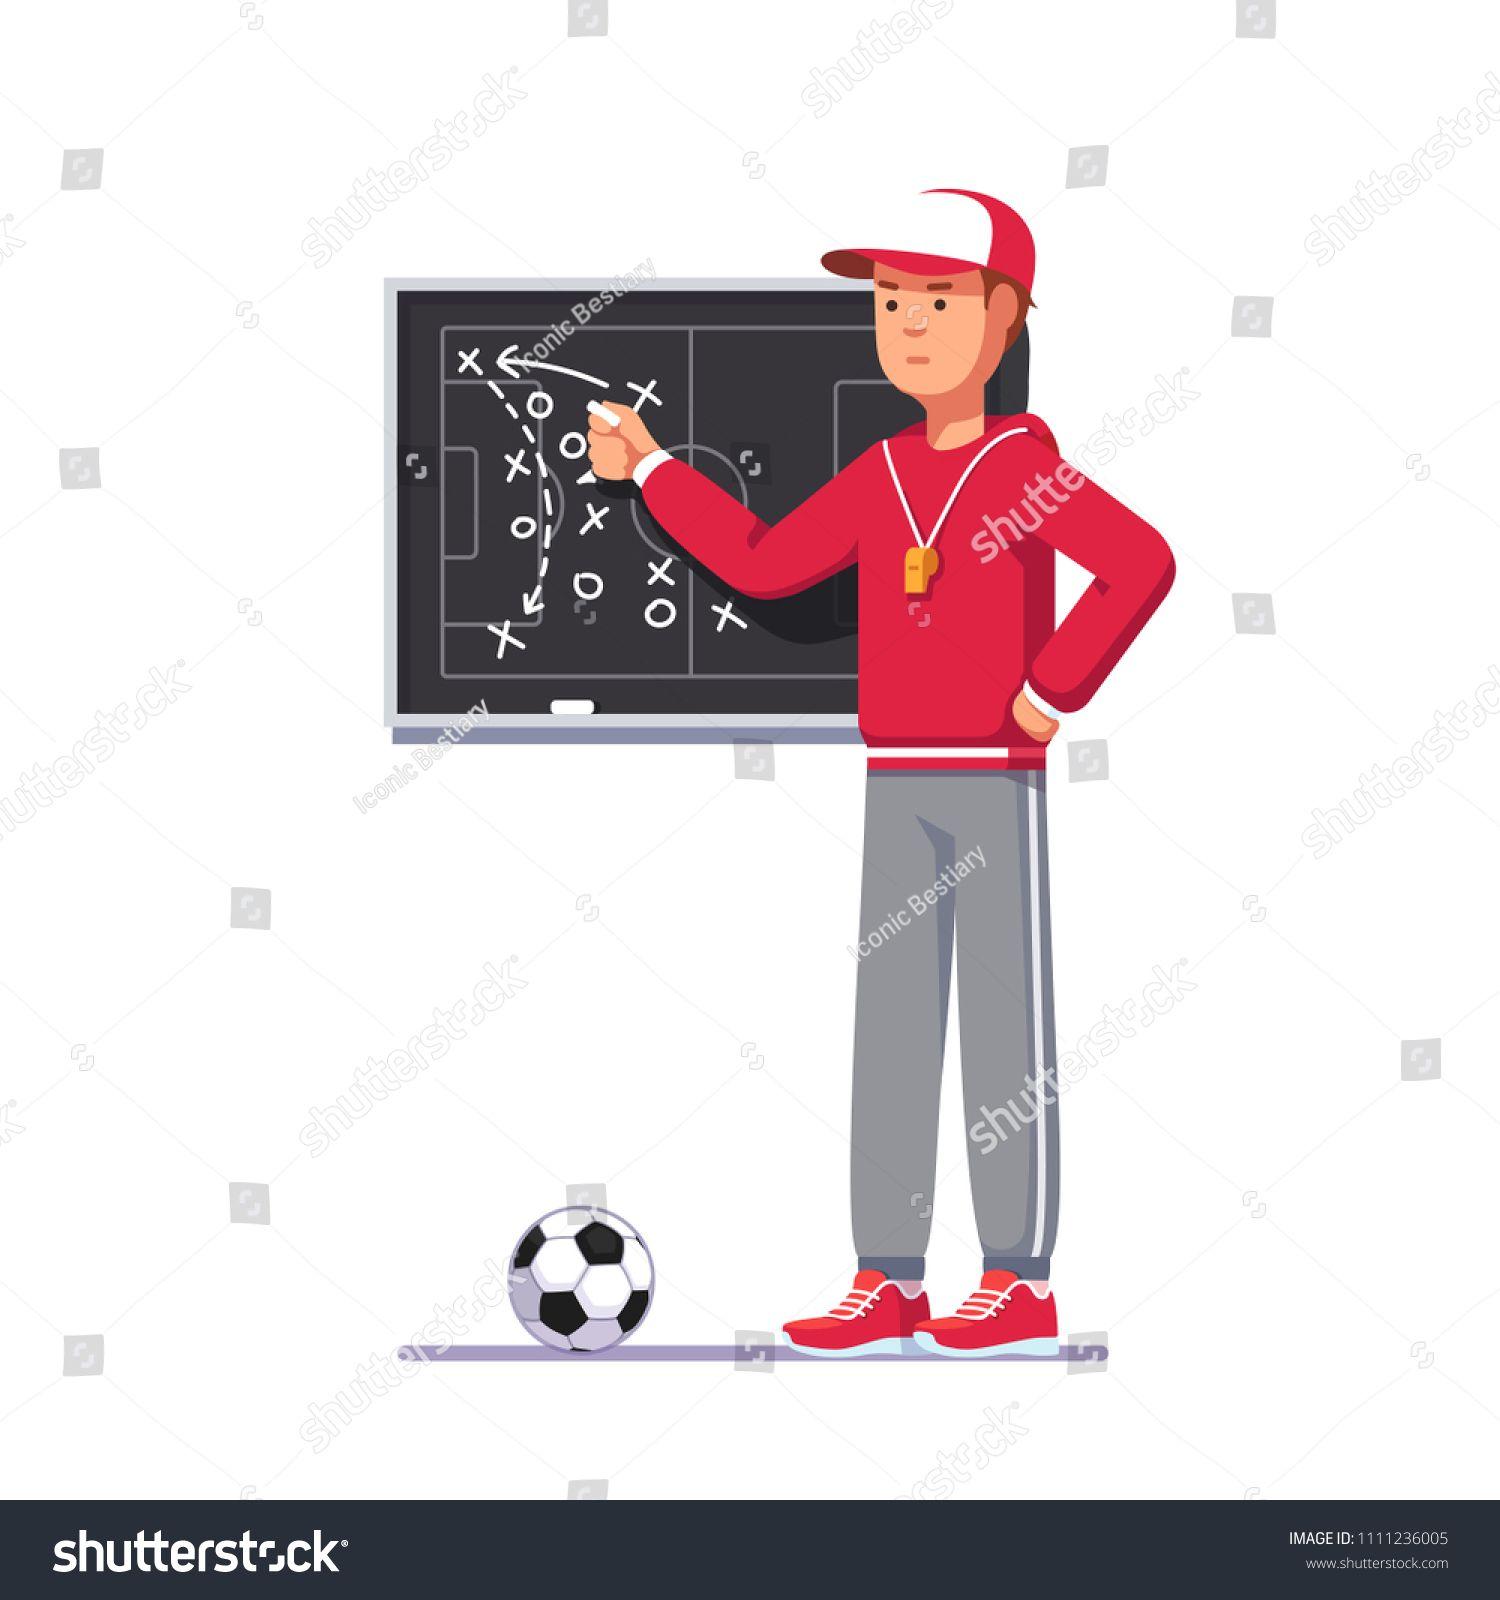 Soccer Coach Man Drawing Game Plan On Chalk Board Playbook Teaching Game Tactics Drawing Games Soccer Coaching Coach Men